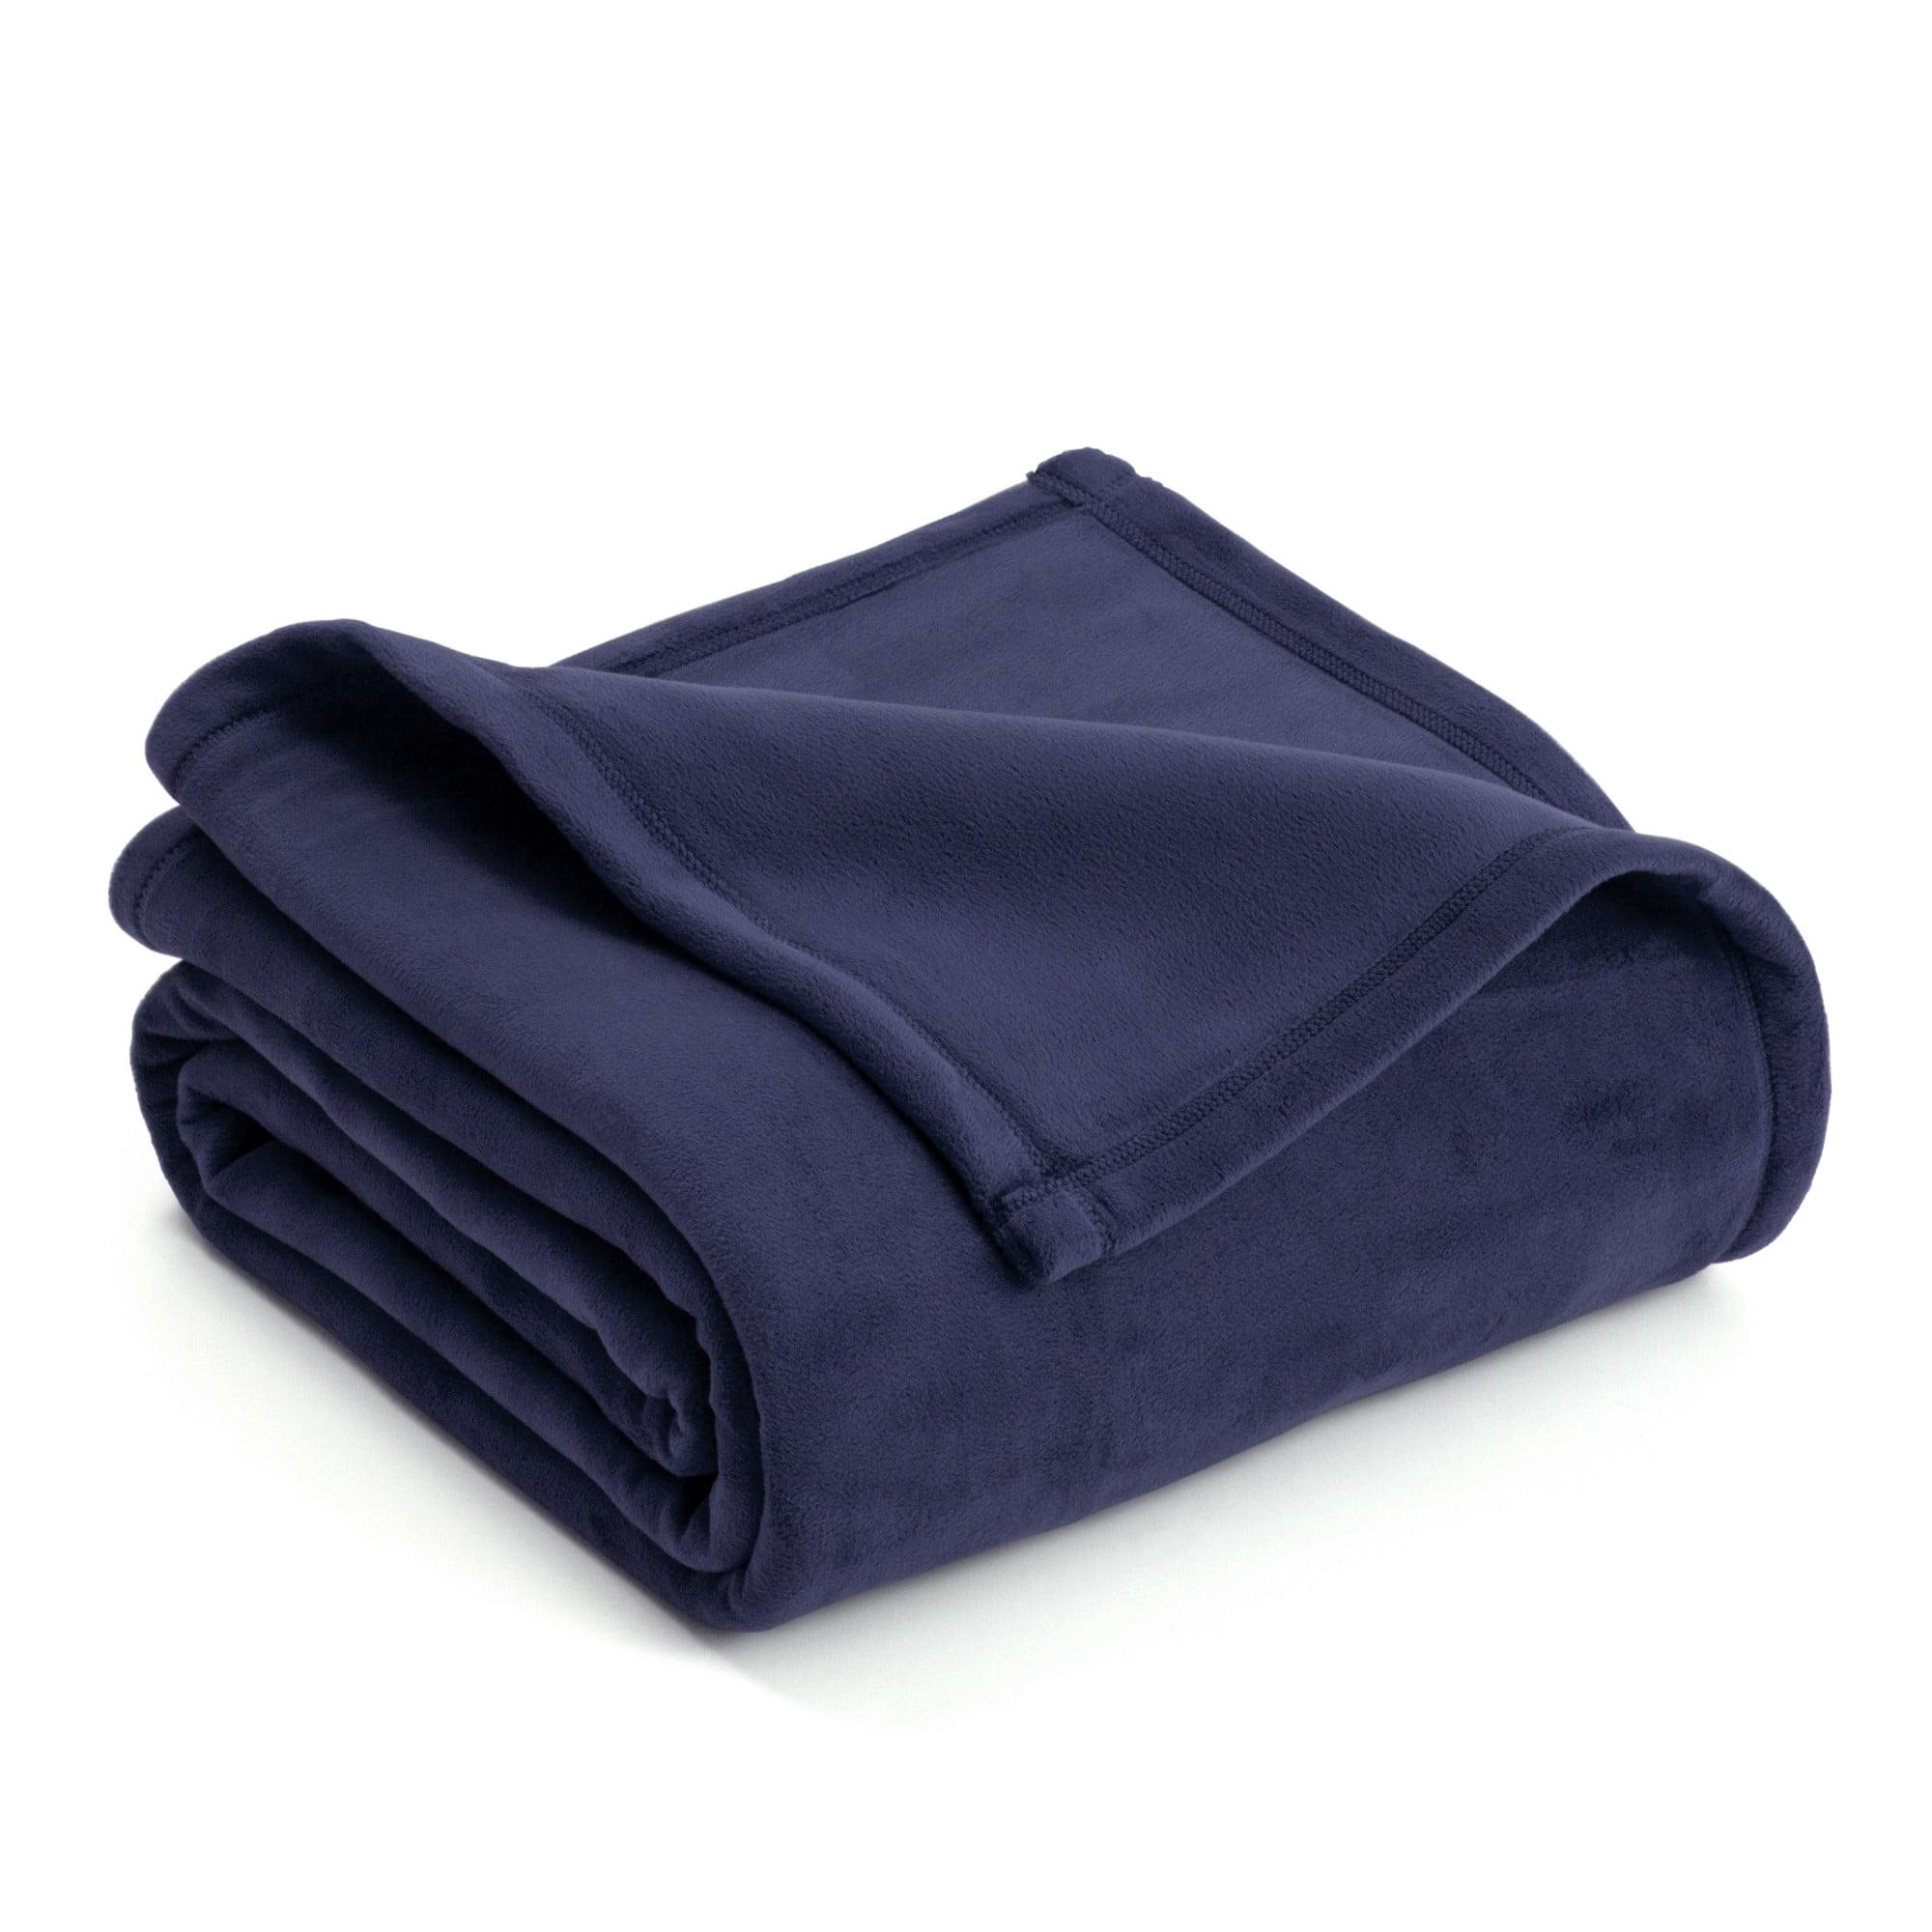 Acrylic Mink Blanket Teddy Treasure BLUE